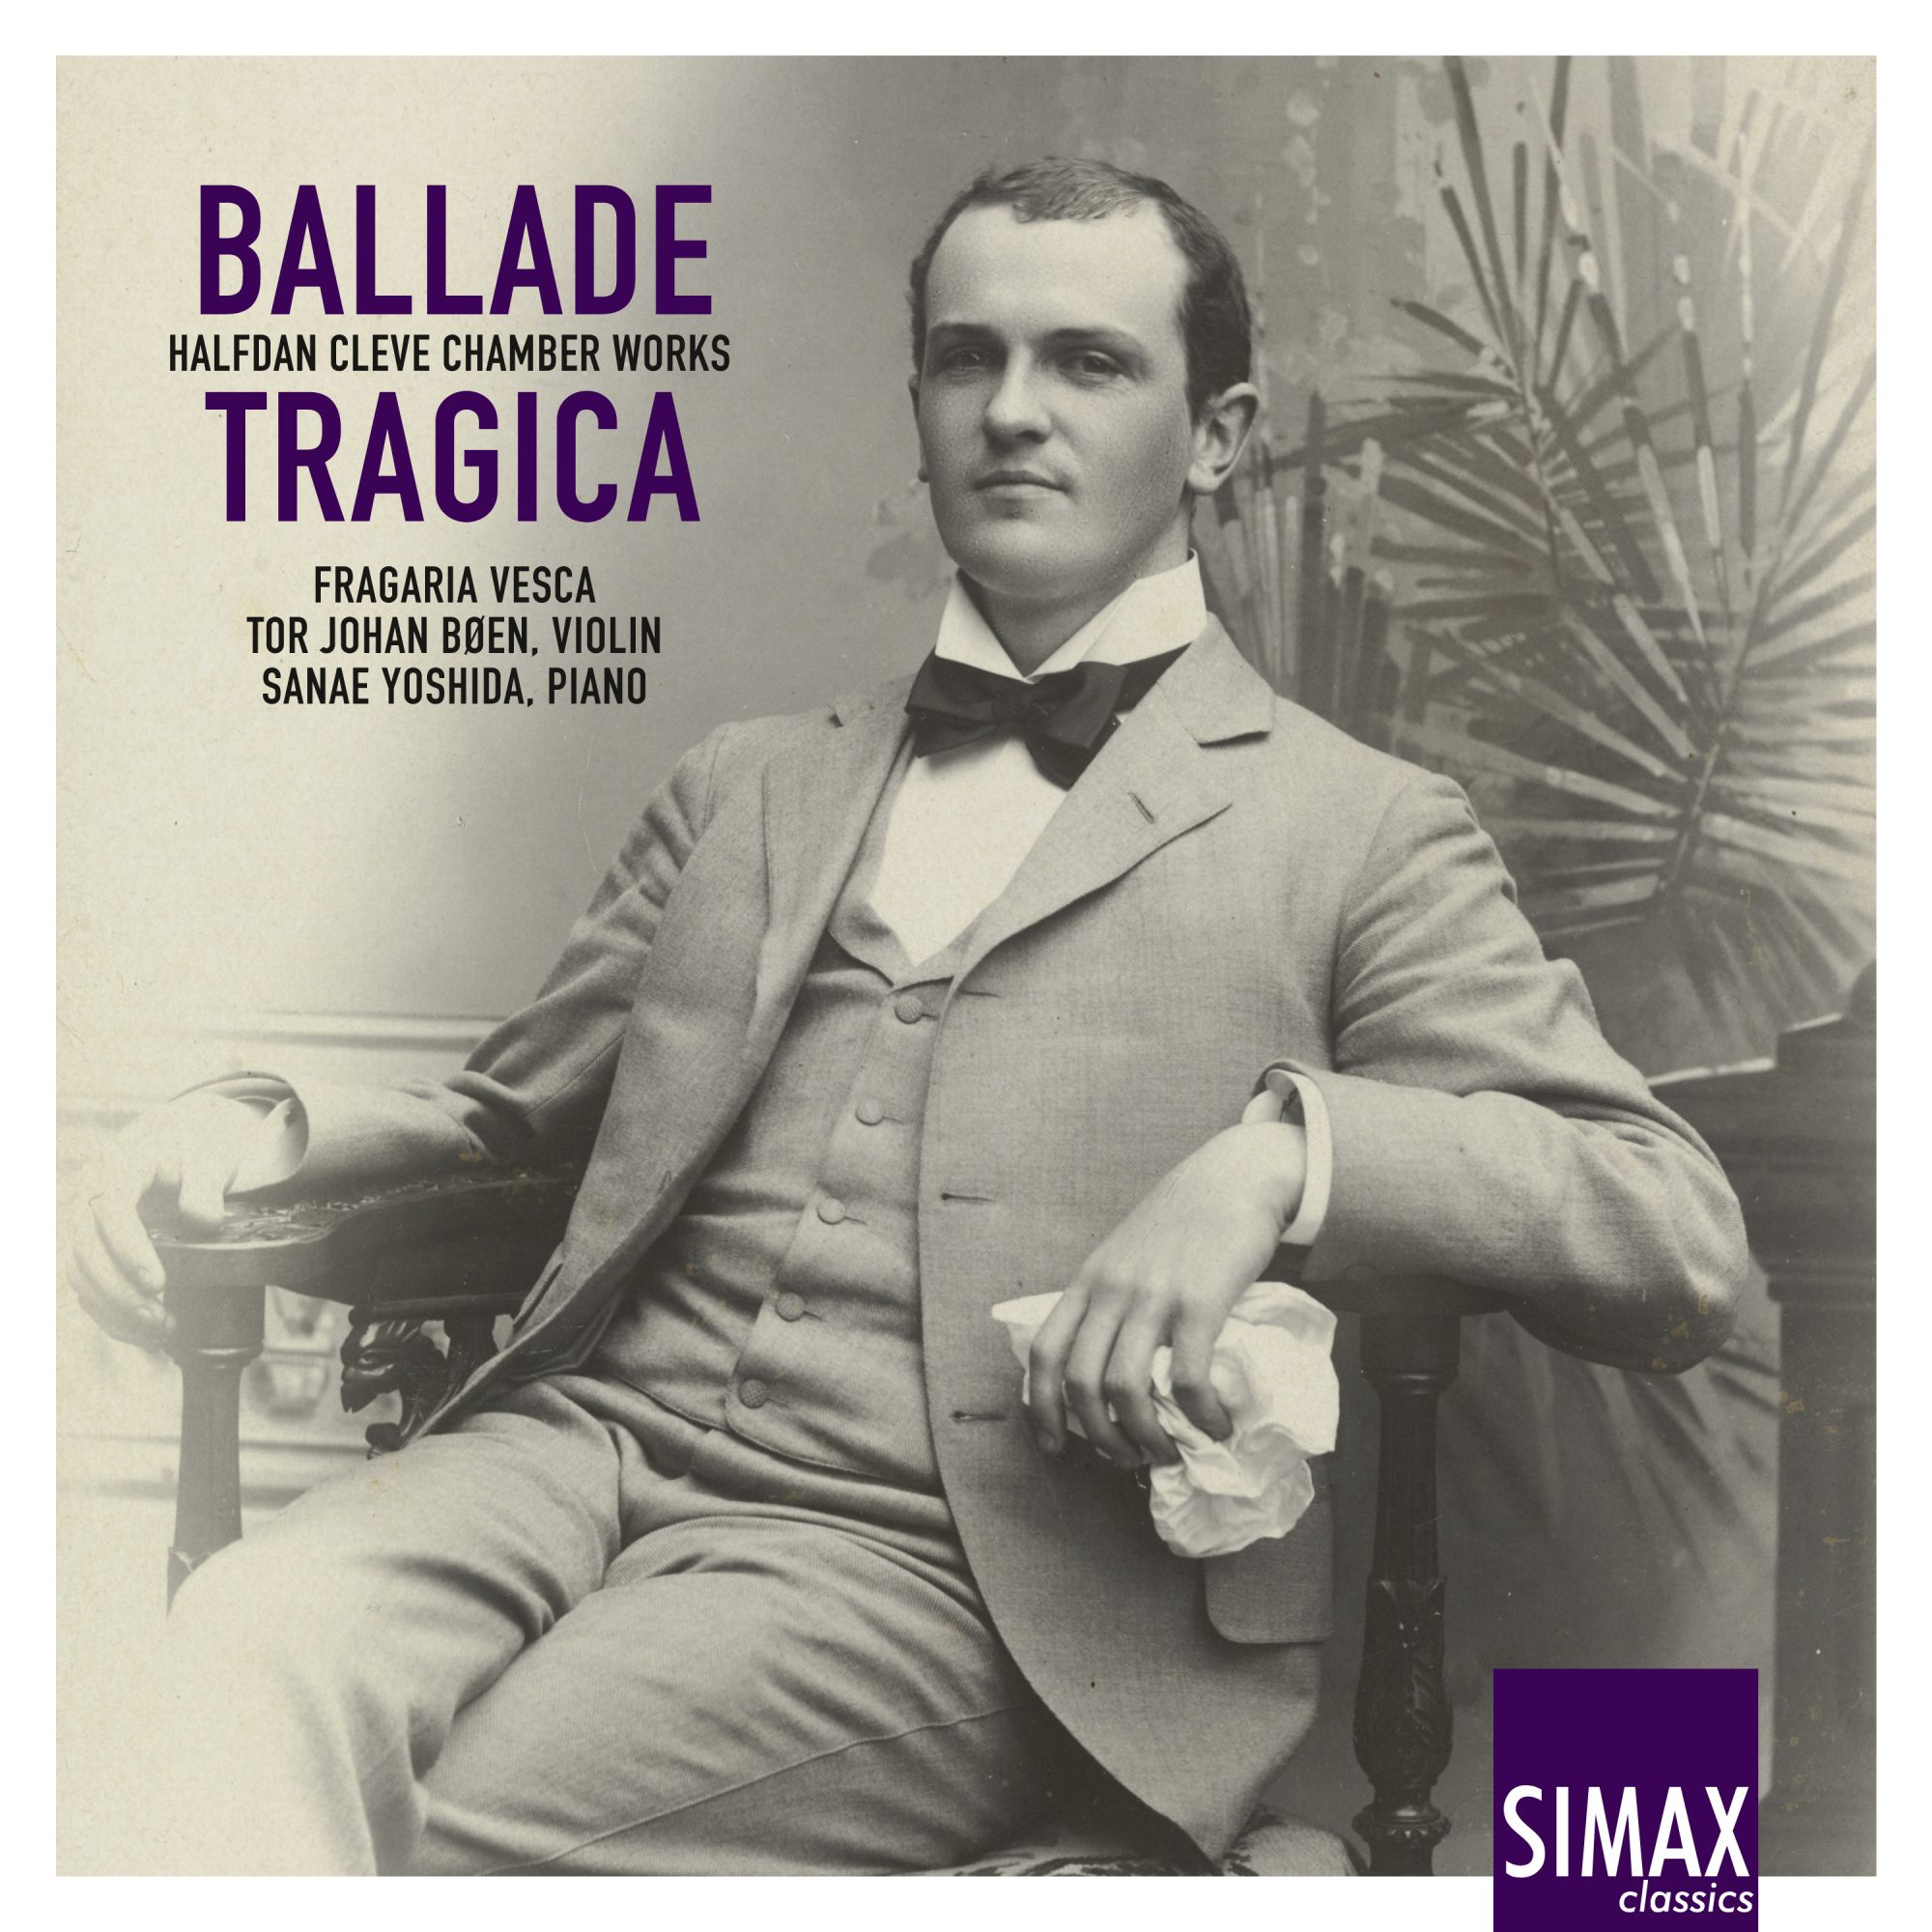 http://arkiv.klassiskmusikk.com/wp-content/uploads/2018/08/PSC1343_Halfdan_Cleve_Ballade_Tragica3000x3000px.jpg